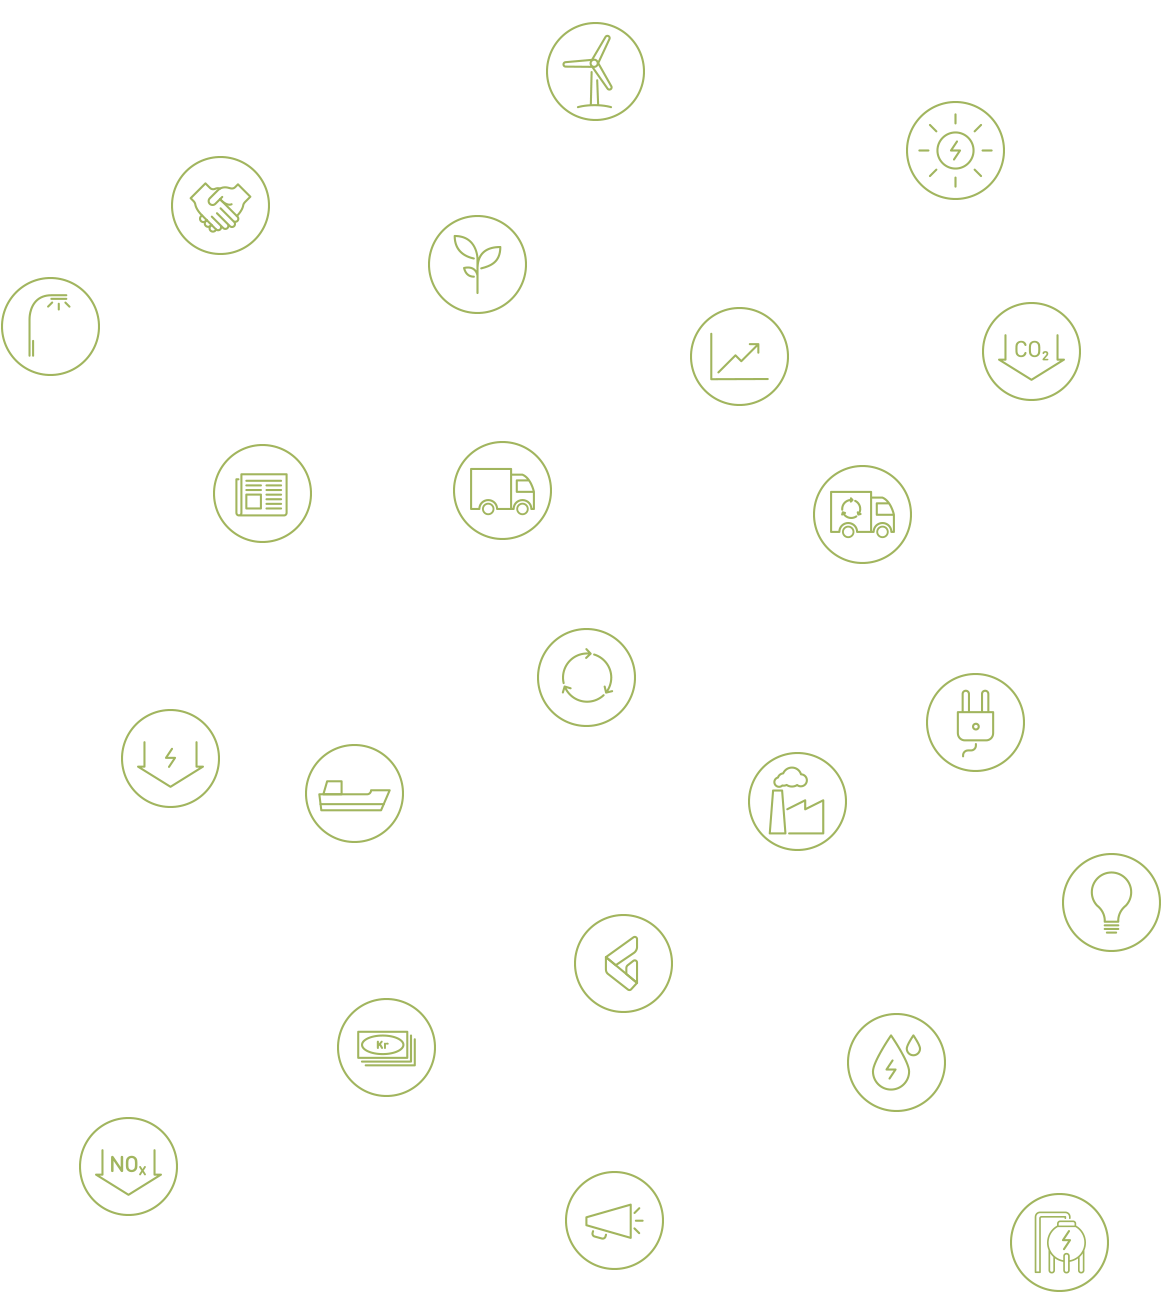 Gronfond-kommunikationsplatform_08